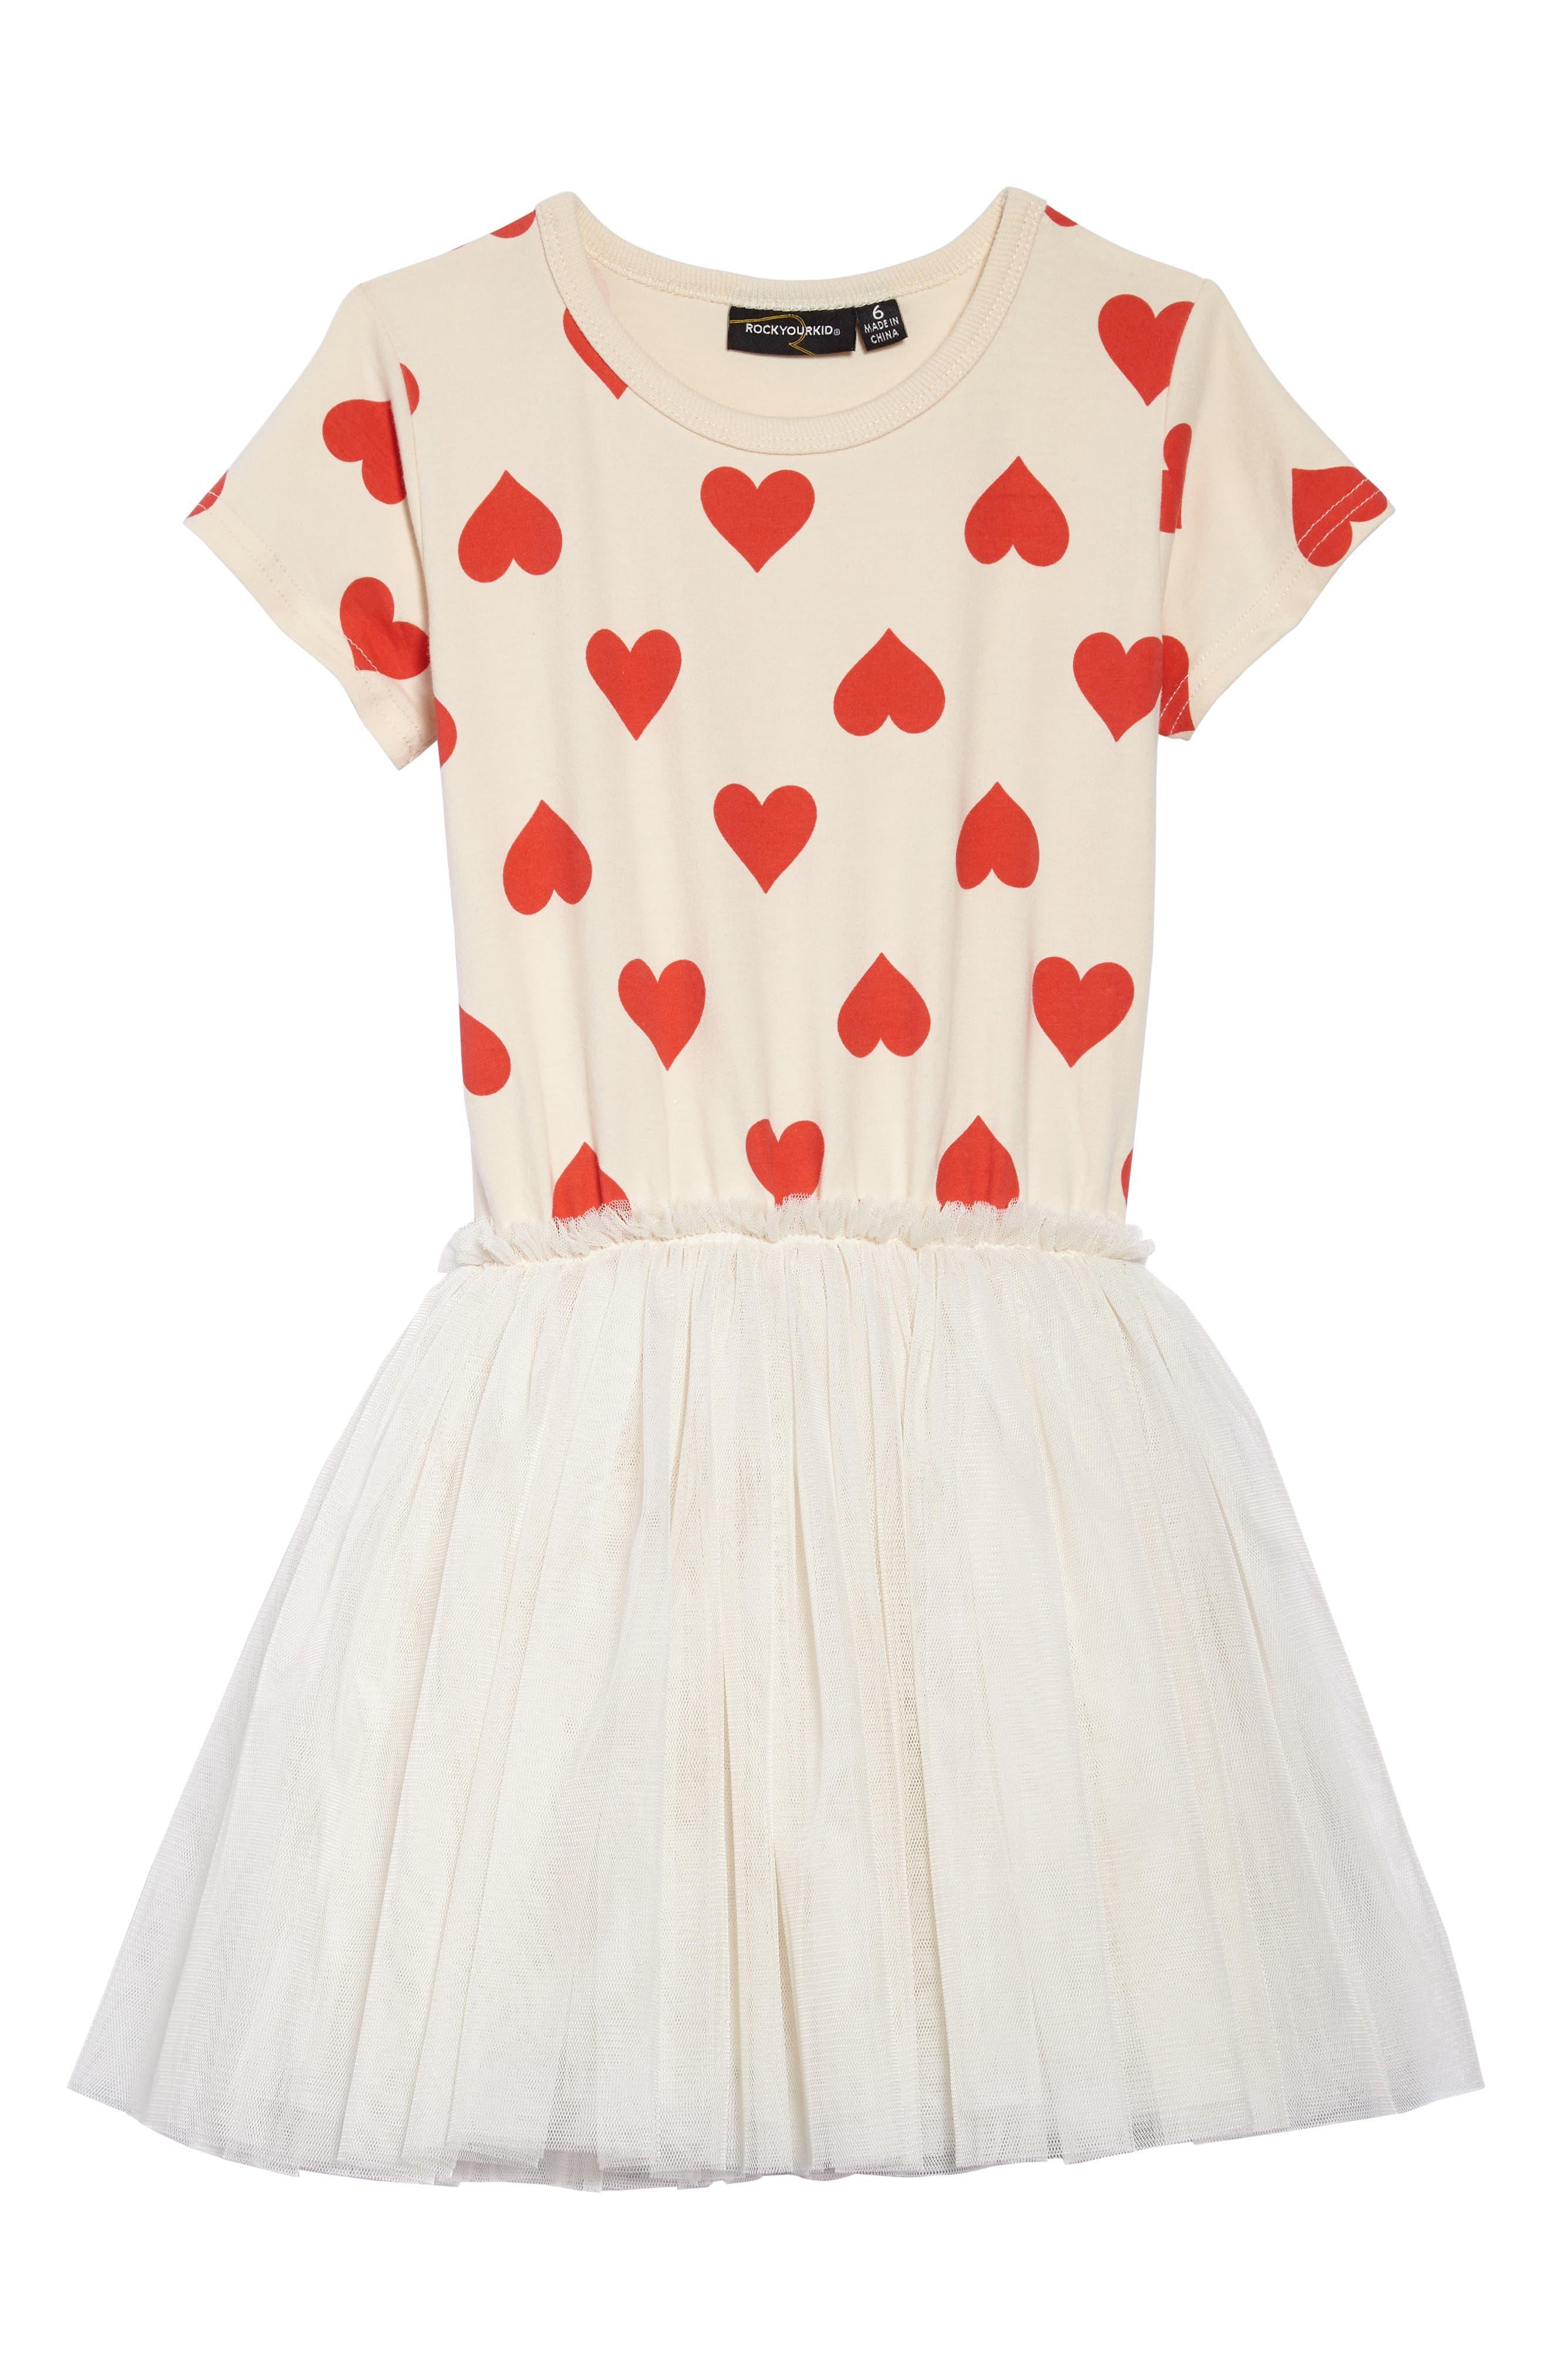 Sweetheart Circus Dress,                             Main thumbnail 1, color,                             Oatmeal